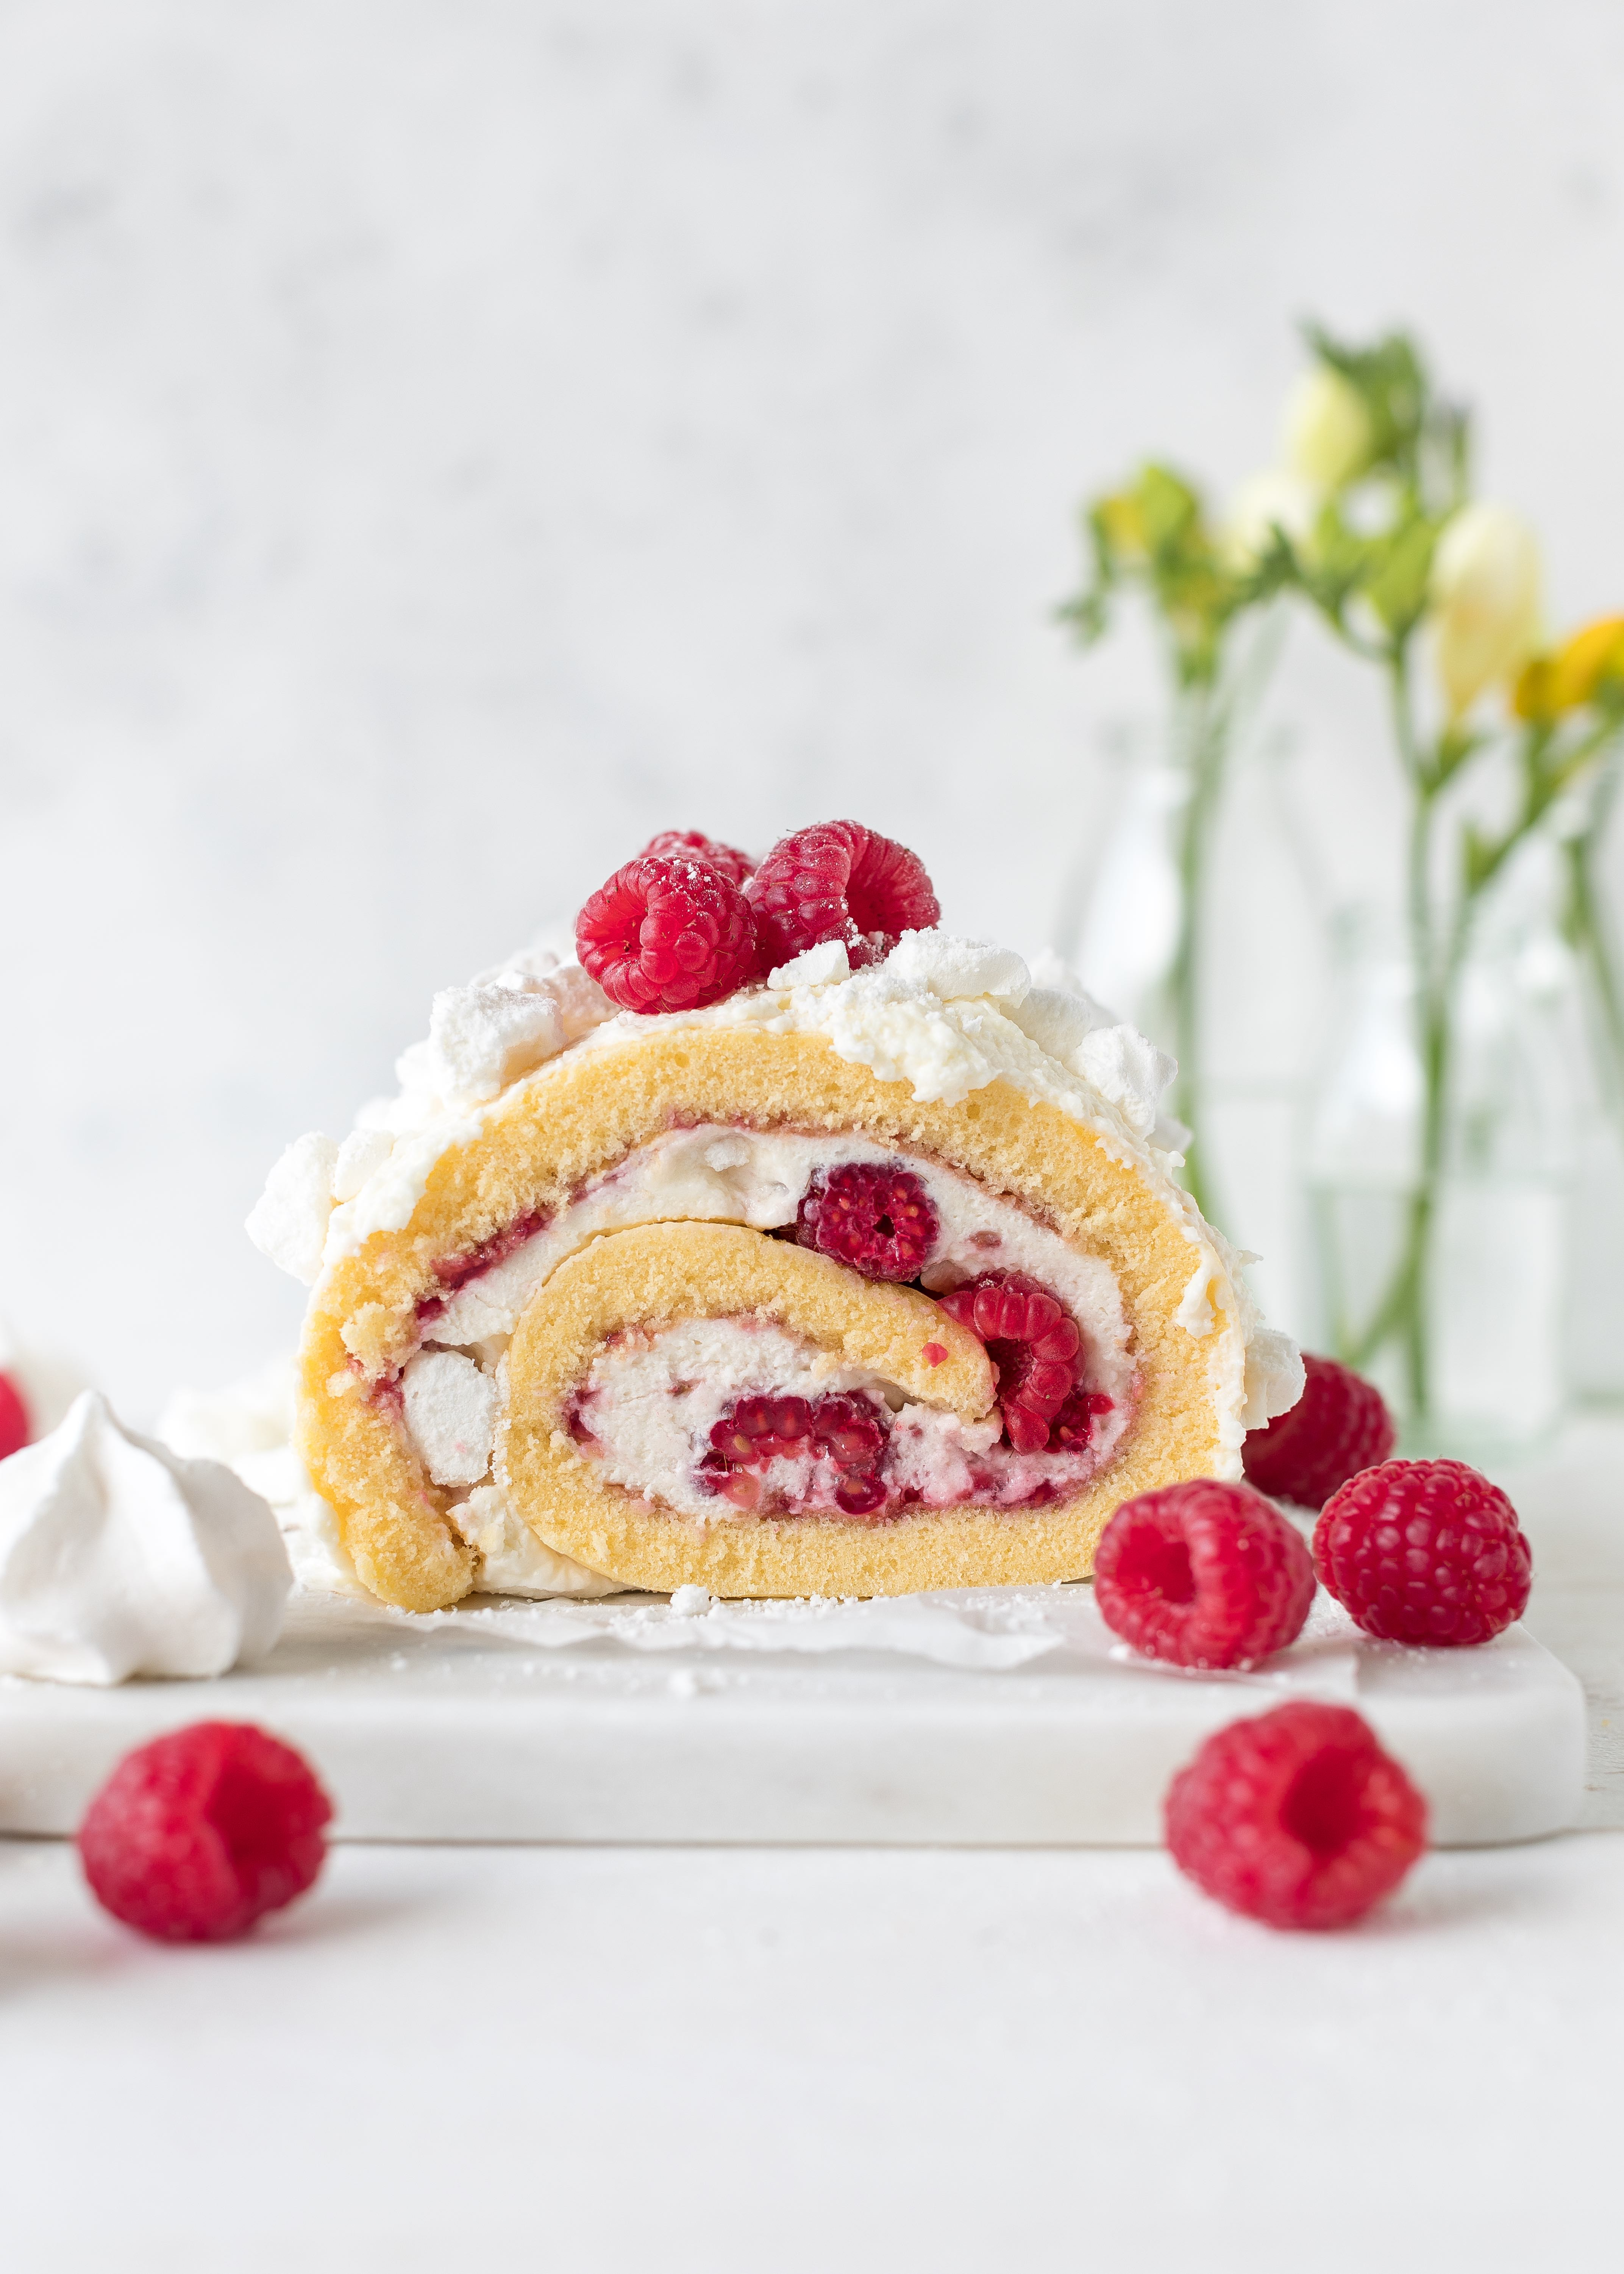 Himbeer Joghurt Biskuitrolle mit Baiser backen Rezept #Biskuitrolle #Himbeeren #baiser #torte #cake #backen | Emma´s Lieblingsstücke